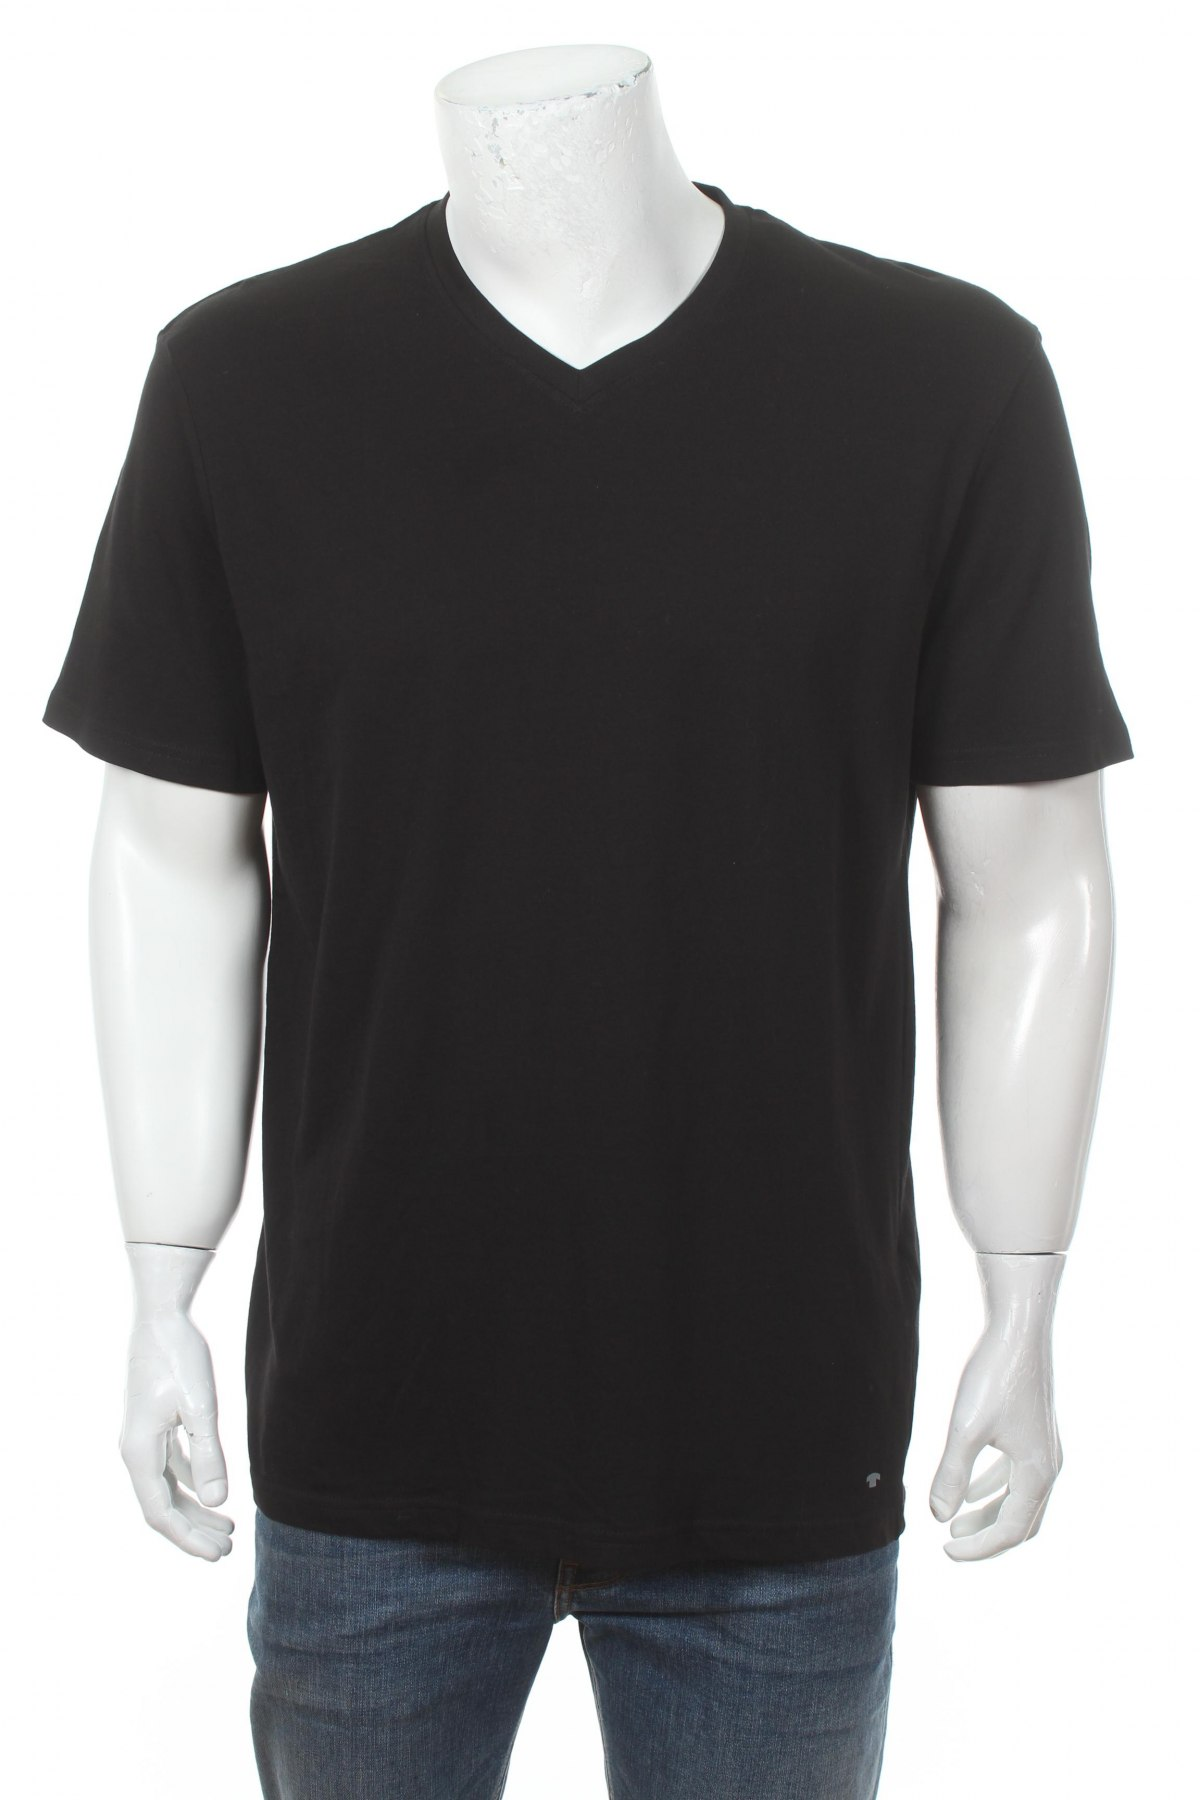 251a5fce6c4 Ανδρικό t-shirt Tom Tailor